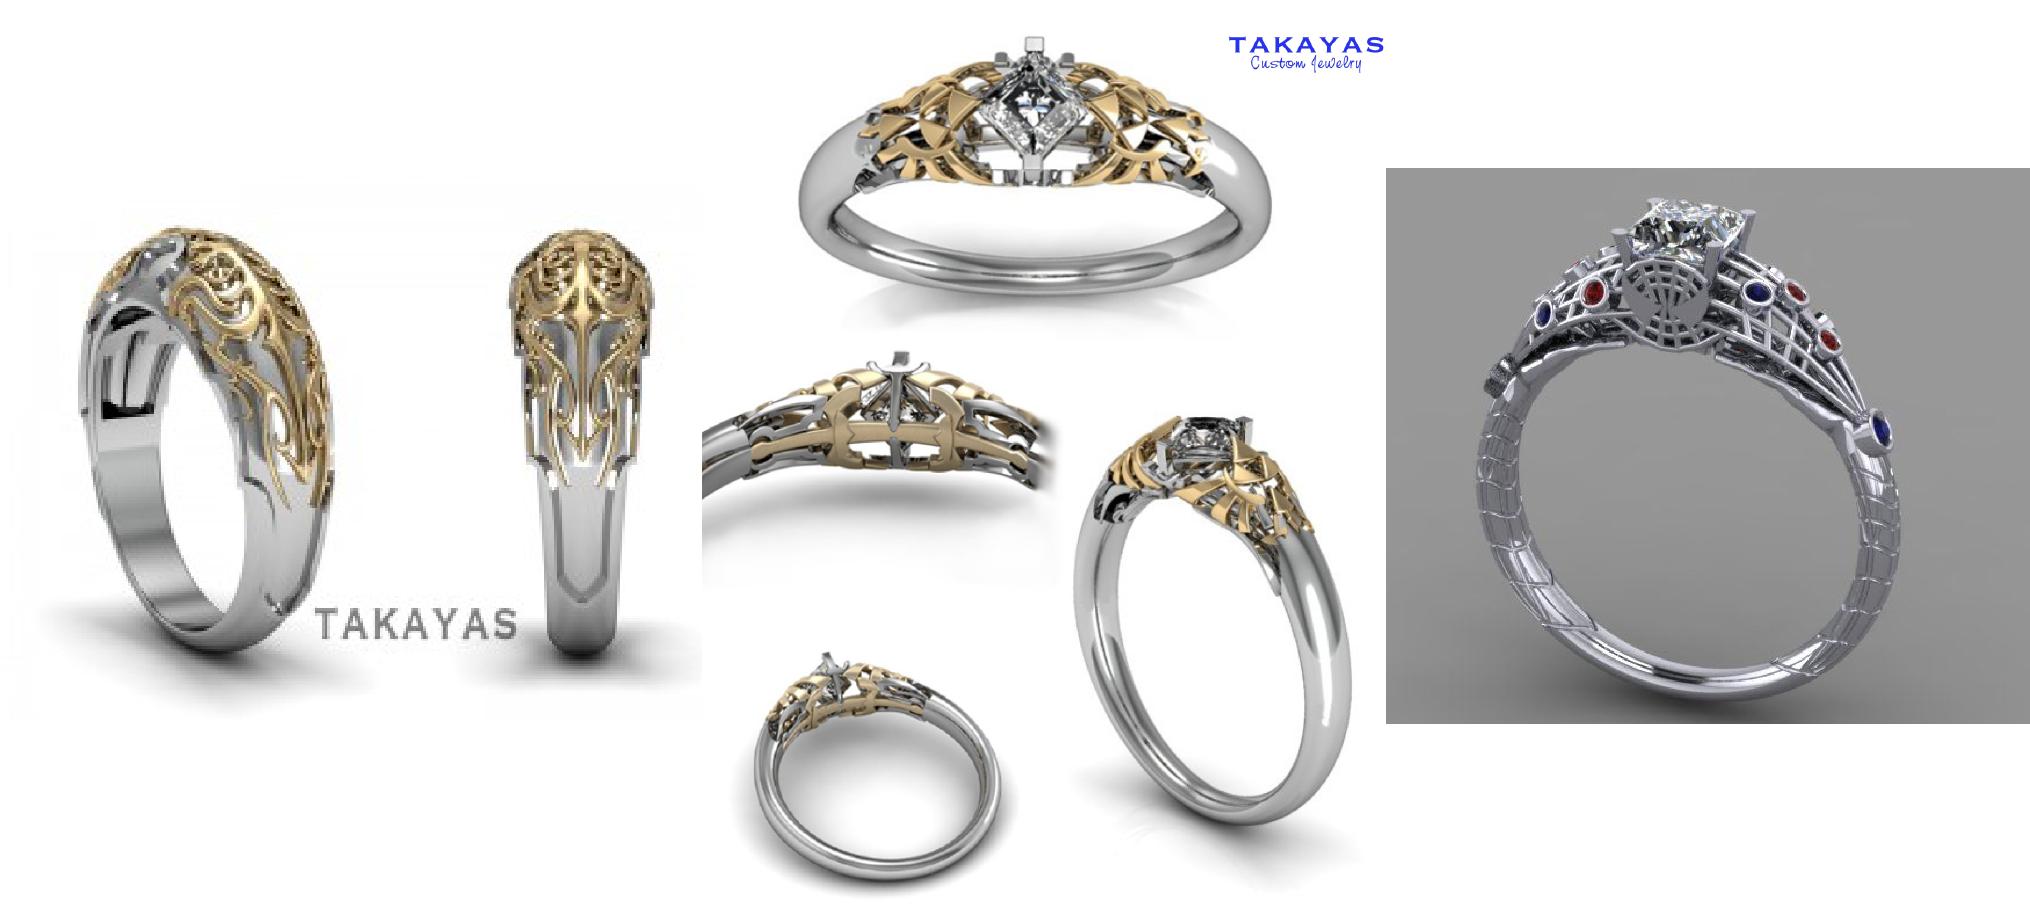 The most beautiful wedding rings Final fantasy wedding rings